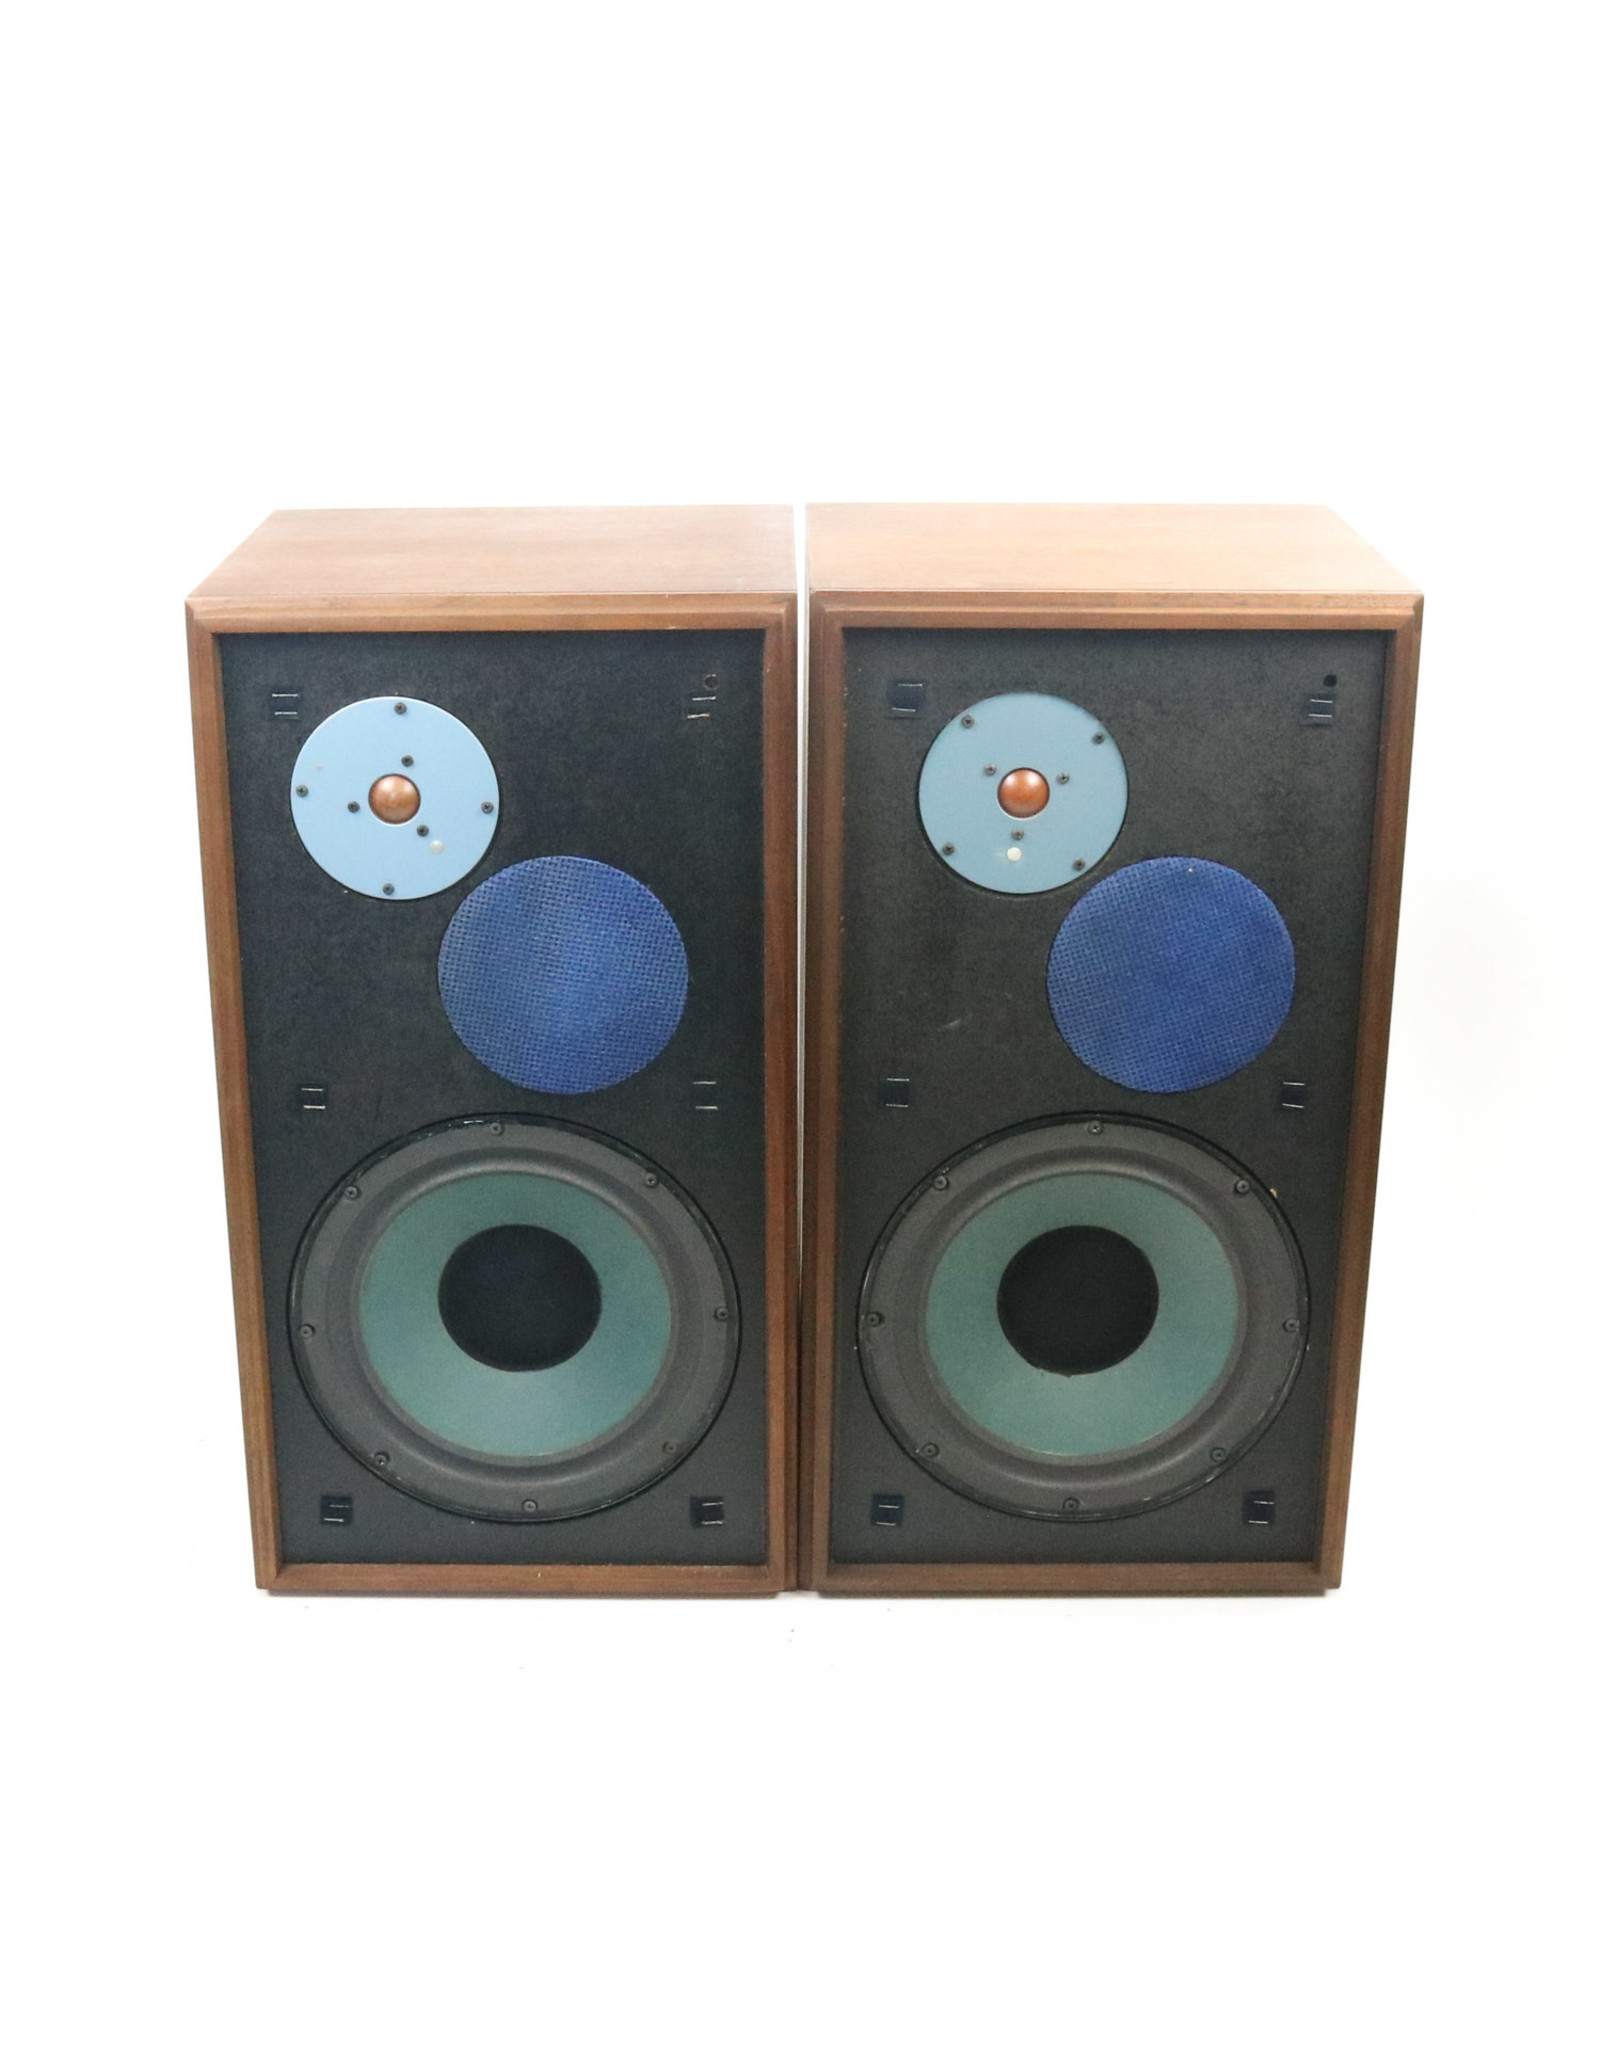 Jensen Jensen 4 Floorstanding Speakers USED